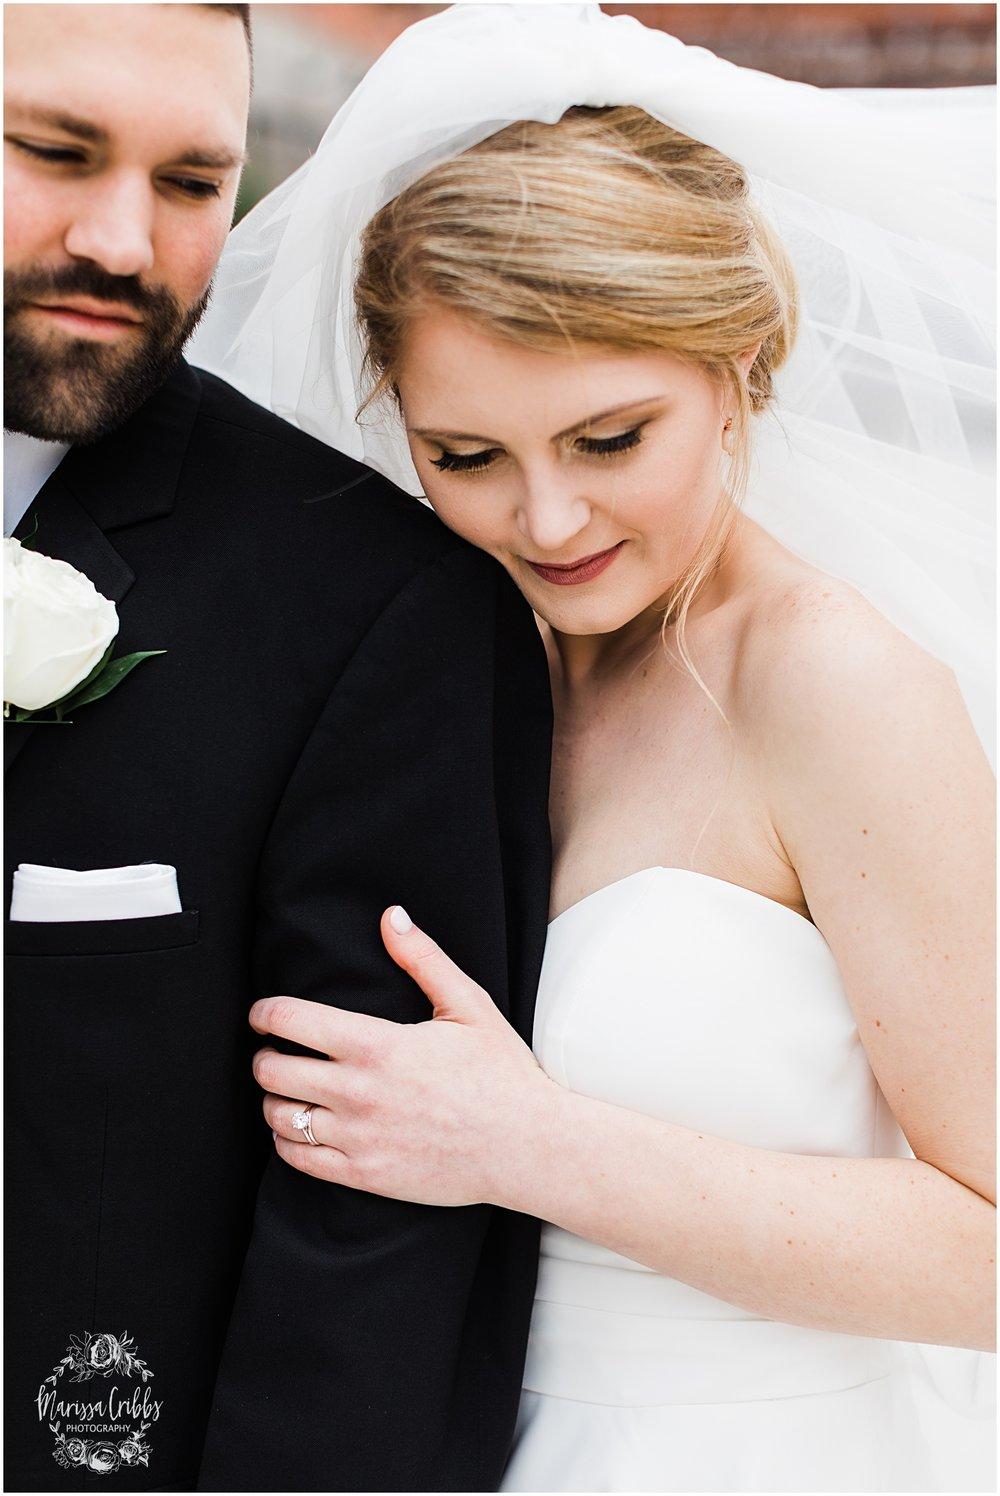 ABBY & CHARLIE WEDDING   THE HUDSON EVENT SPACE WEDDING   MARISSA CRIBBS PHOTOGRAPHY_7516.jpg